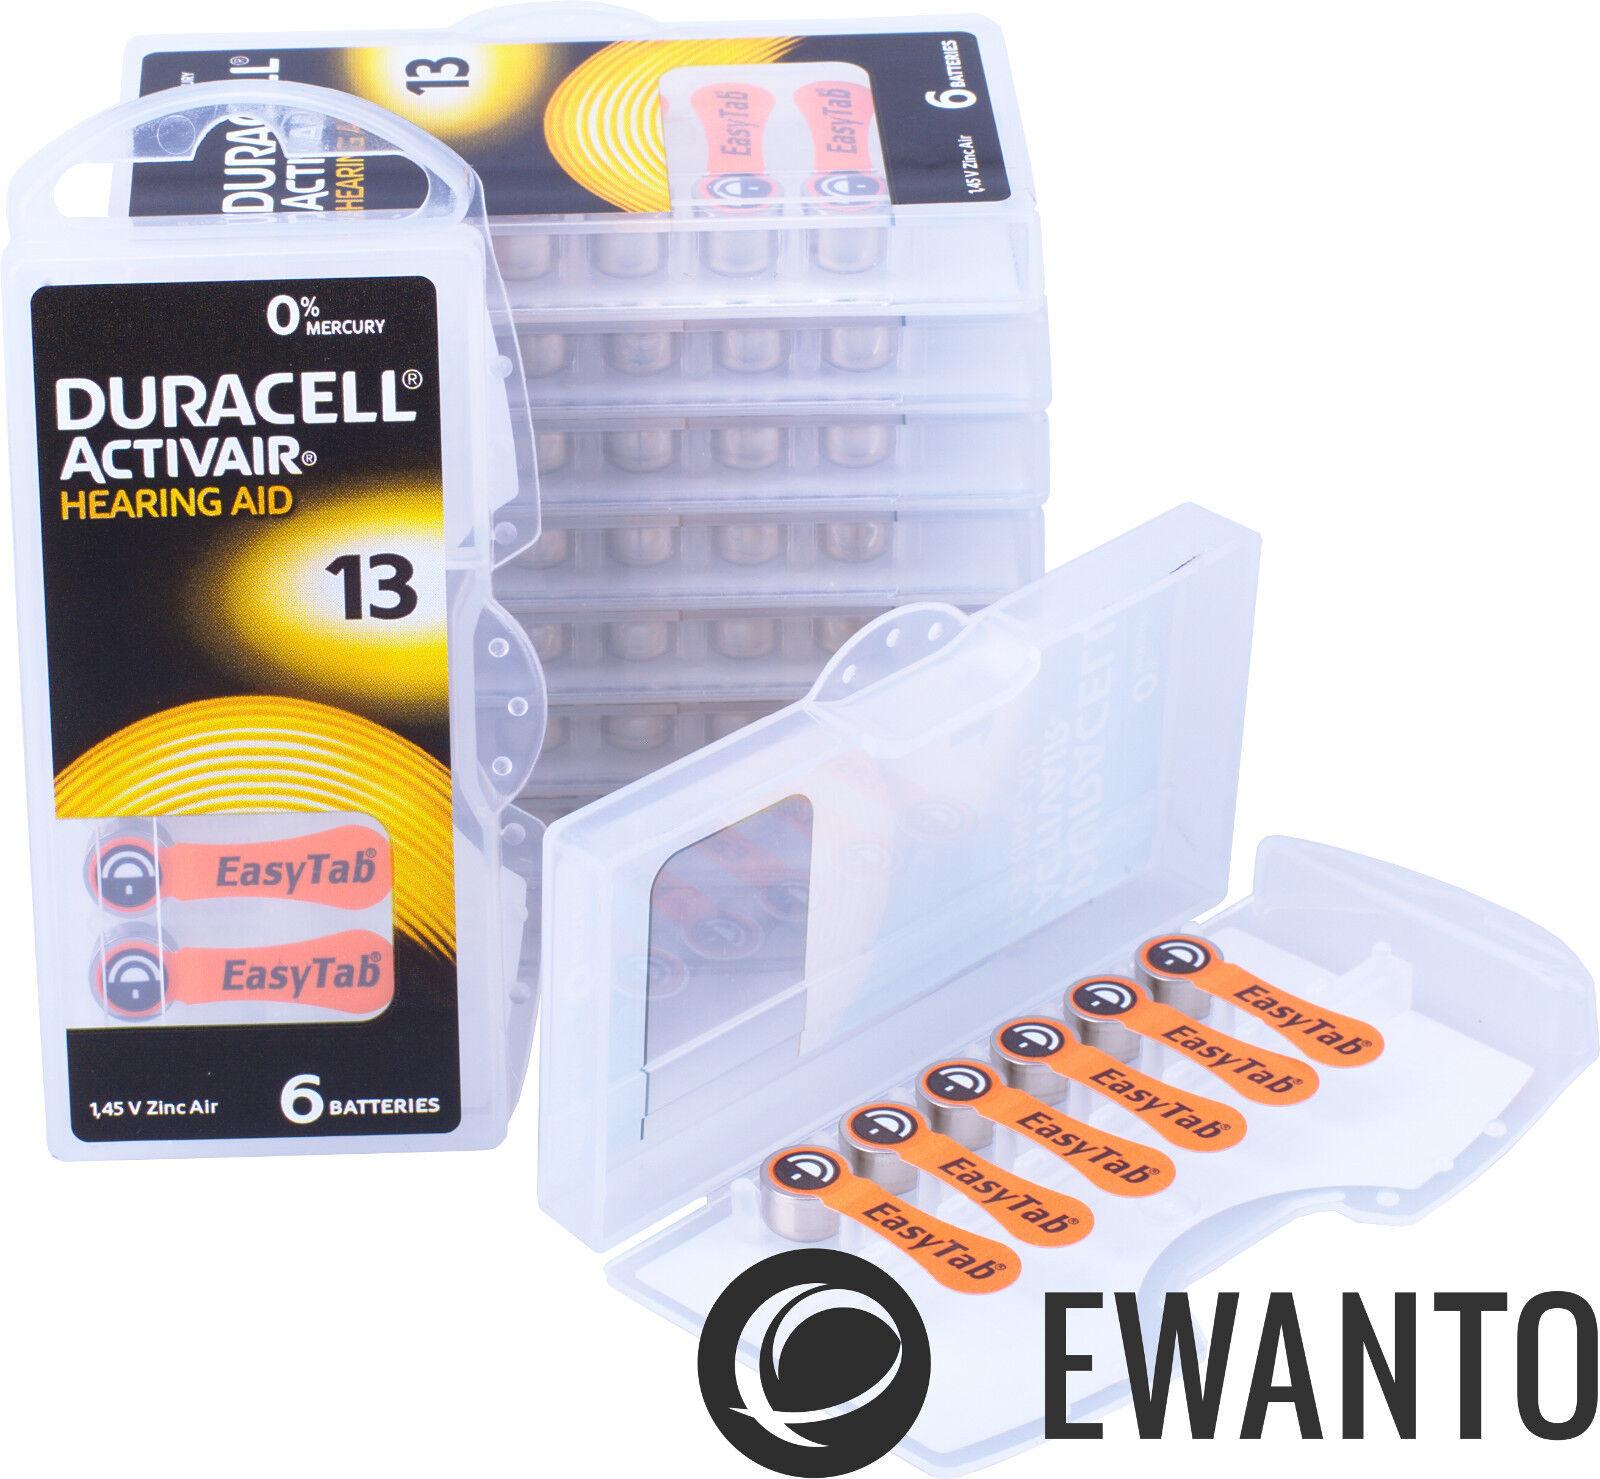 6 x Duracell Activair Hearing Aid Batteries 13 Hearing Aid 24606 6111 6er Blister